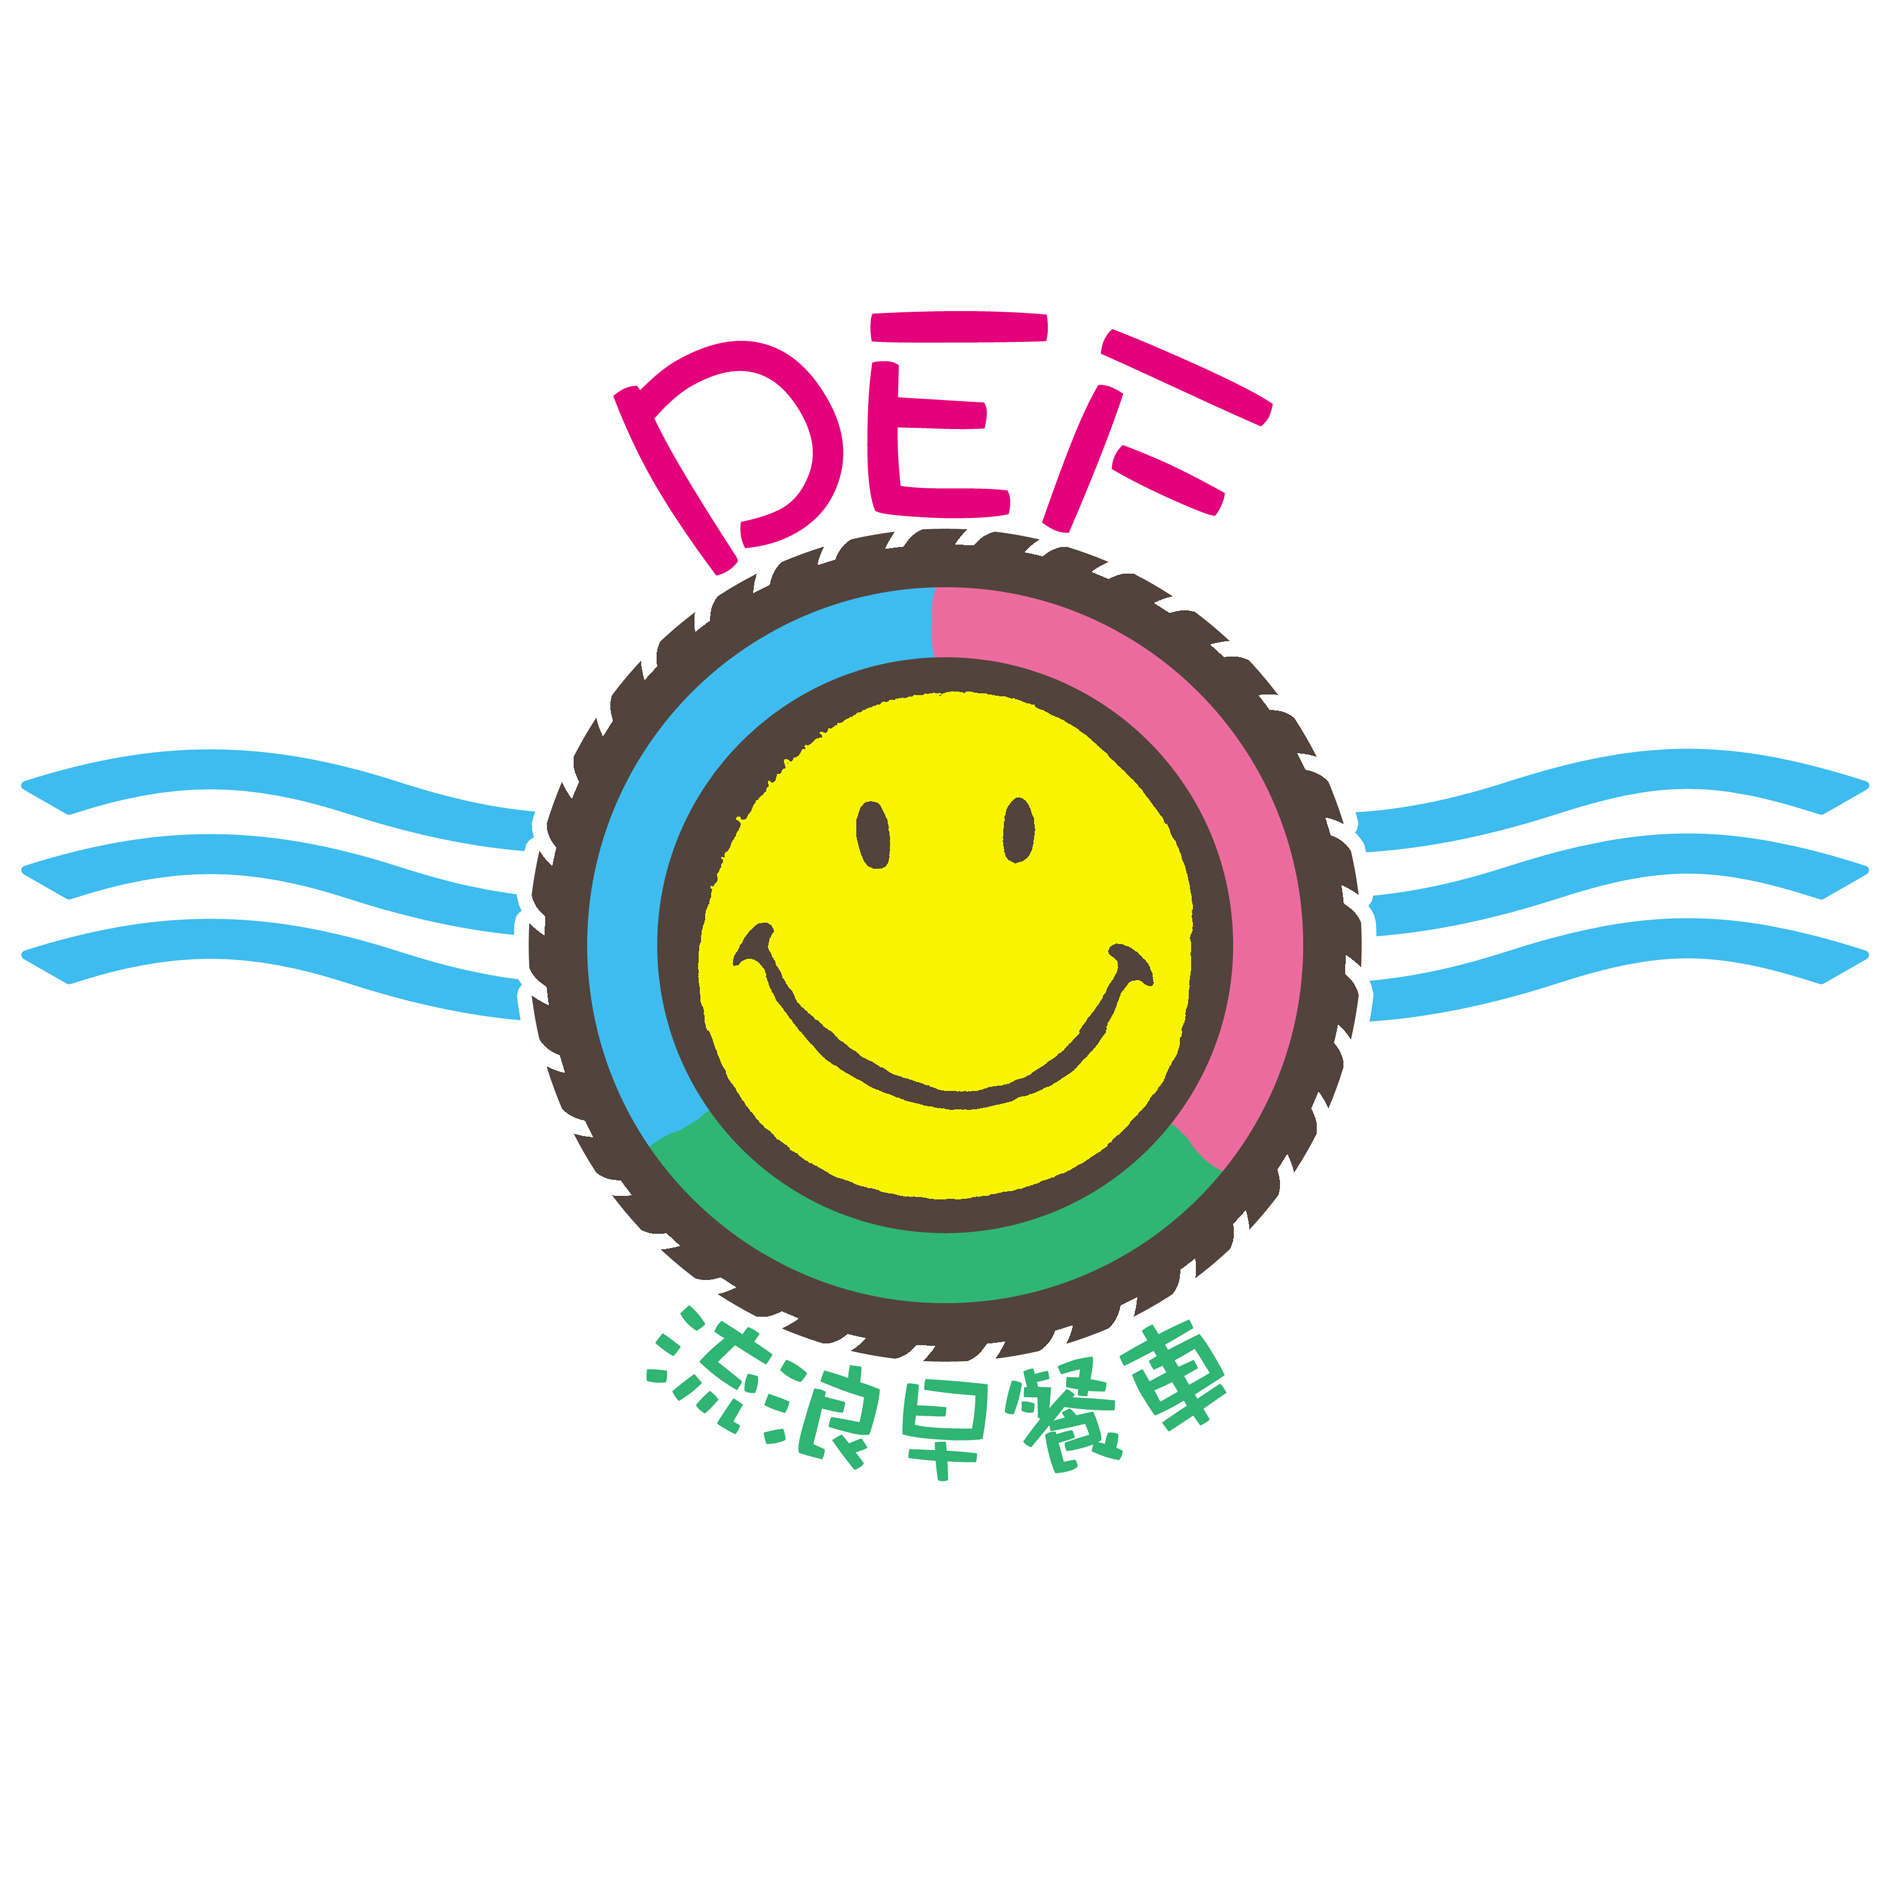 Driftcar_logo 07.jpg